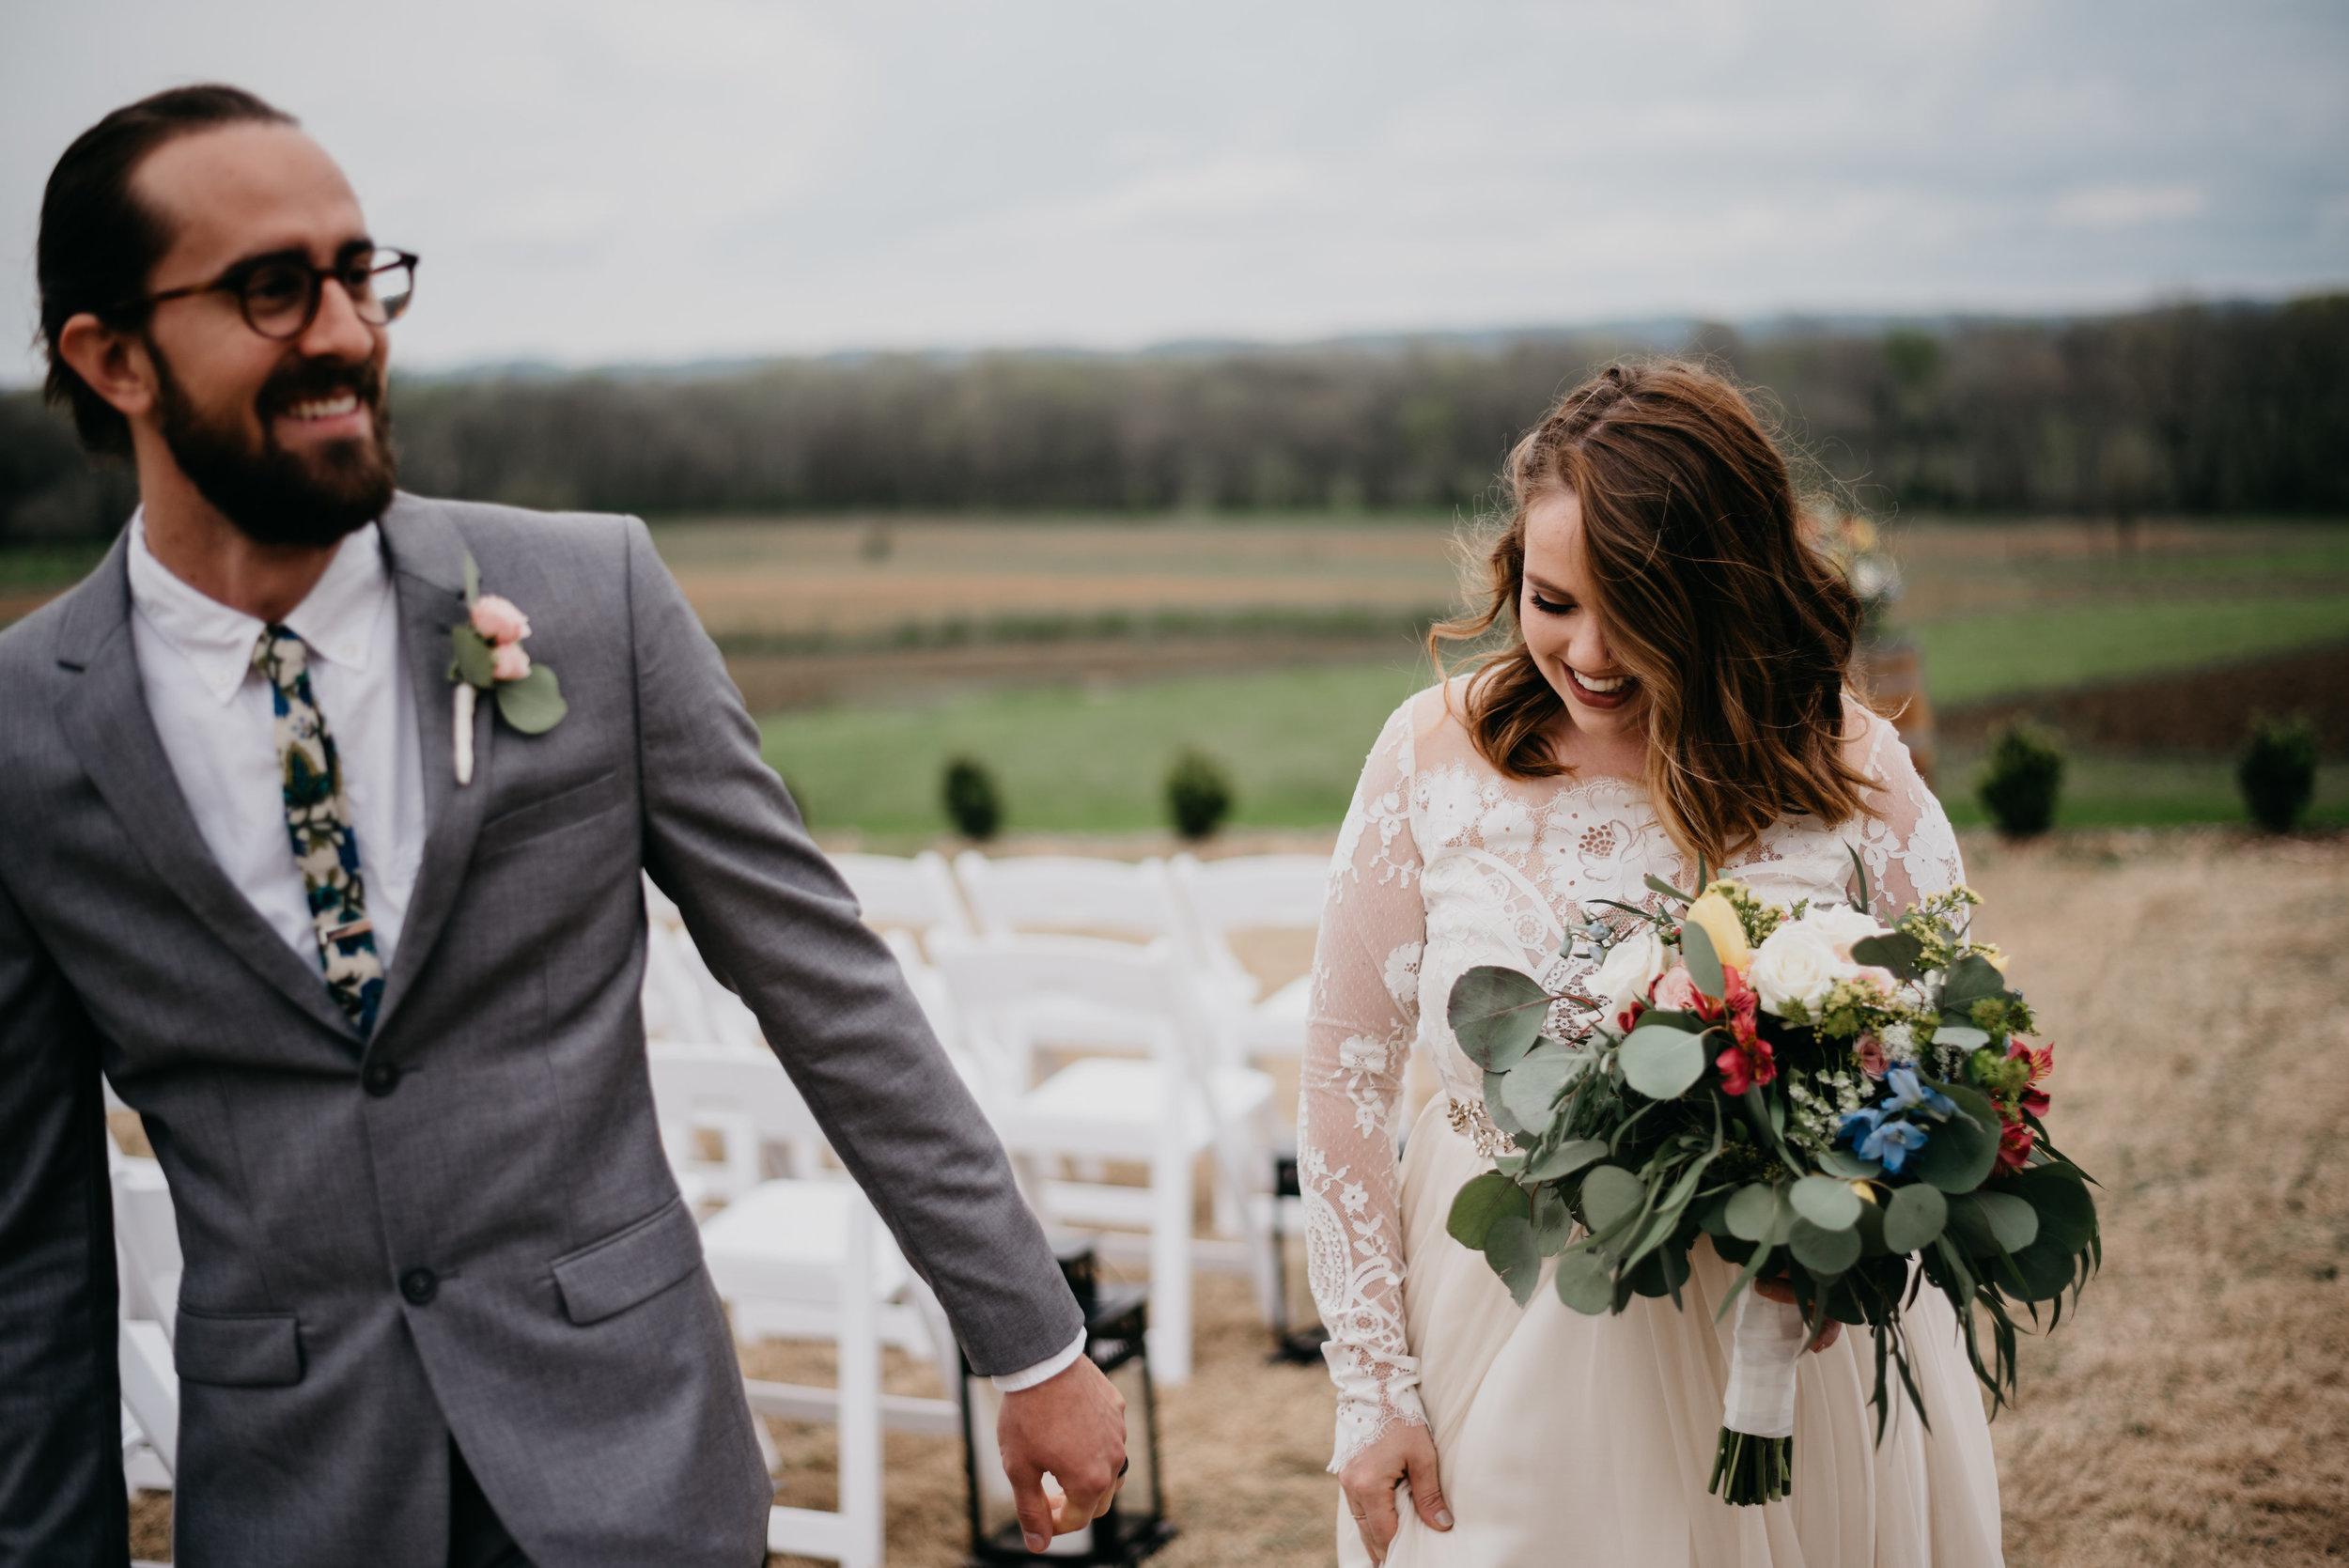 Allenbrooke-Farms-Nashville-Wedding-Photographers 9.jpg